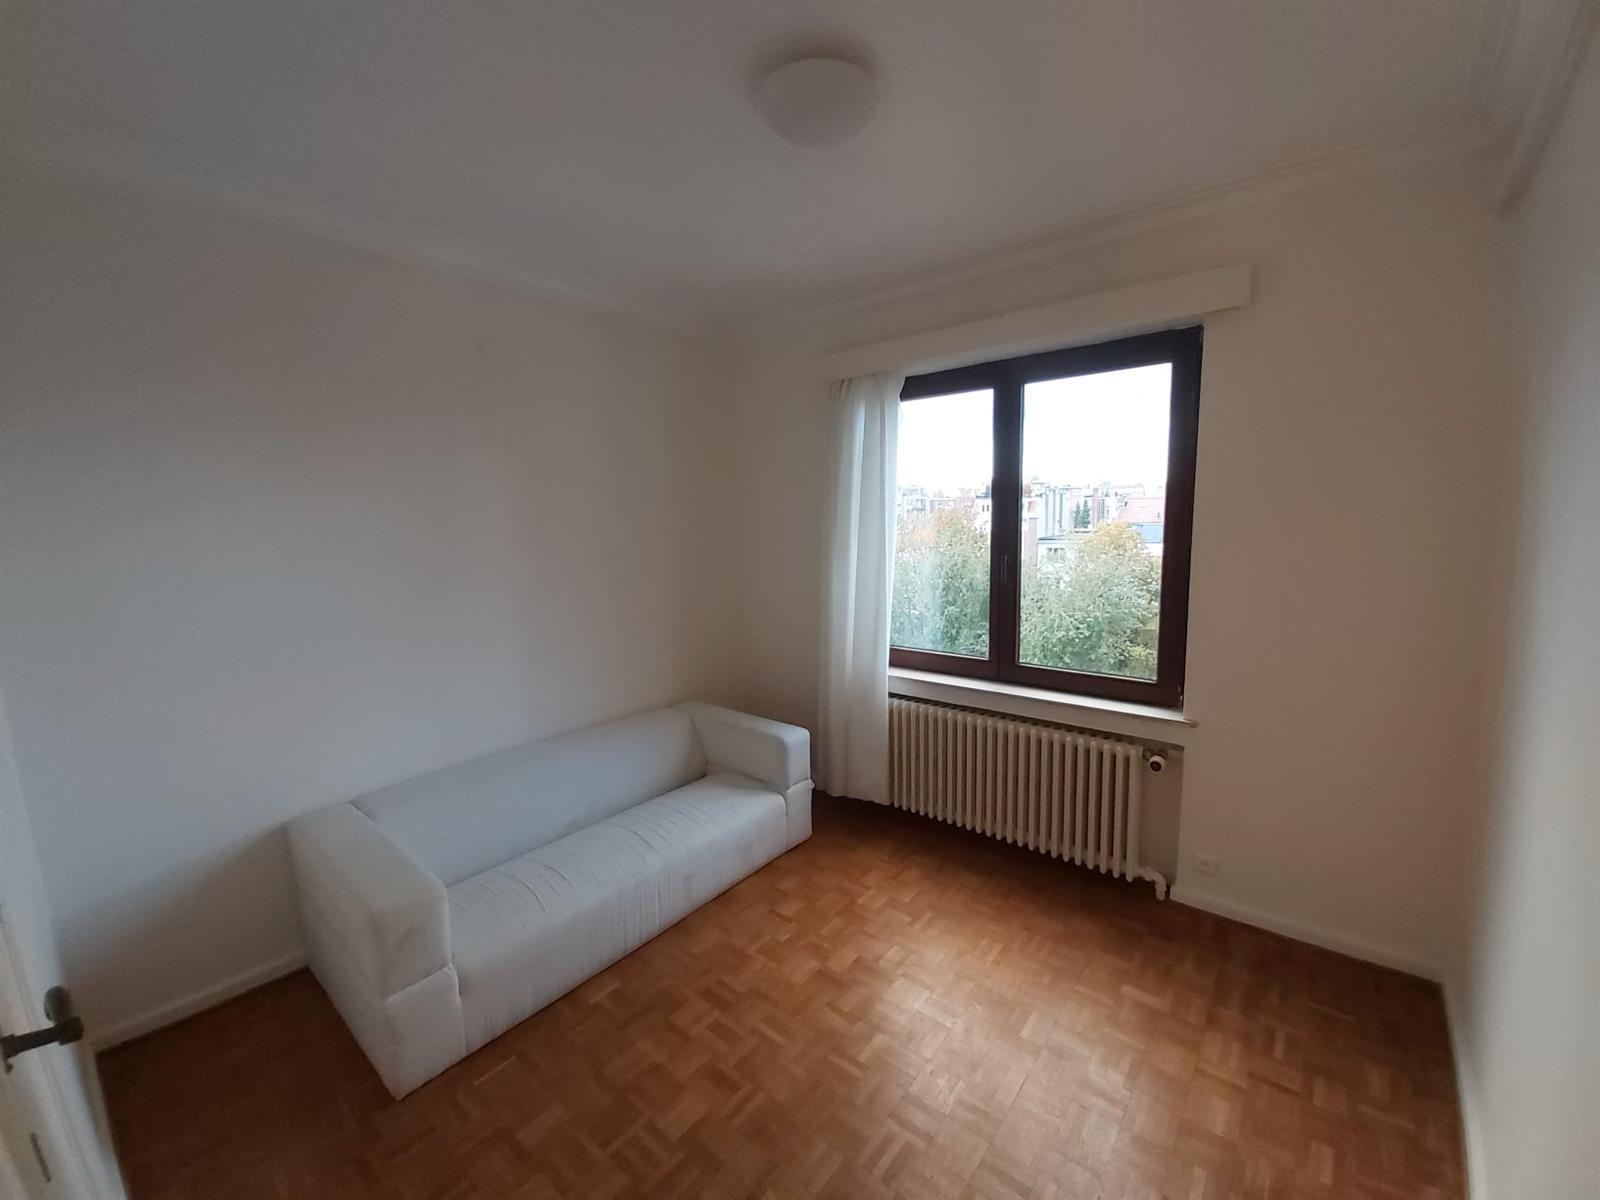 Appartement - Woluwe-Saint-Lambert - #4174735-7